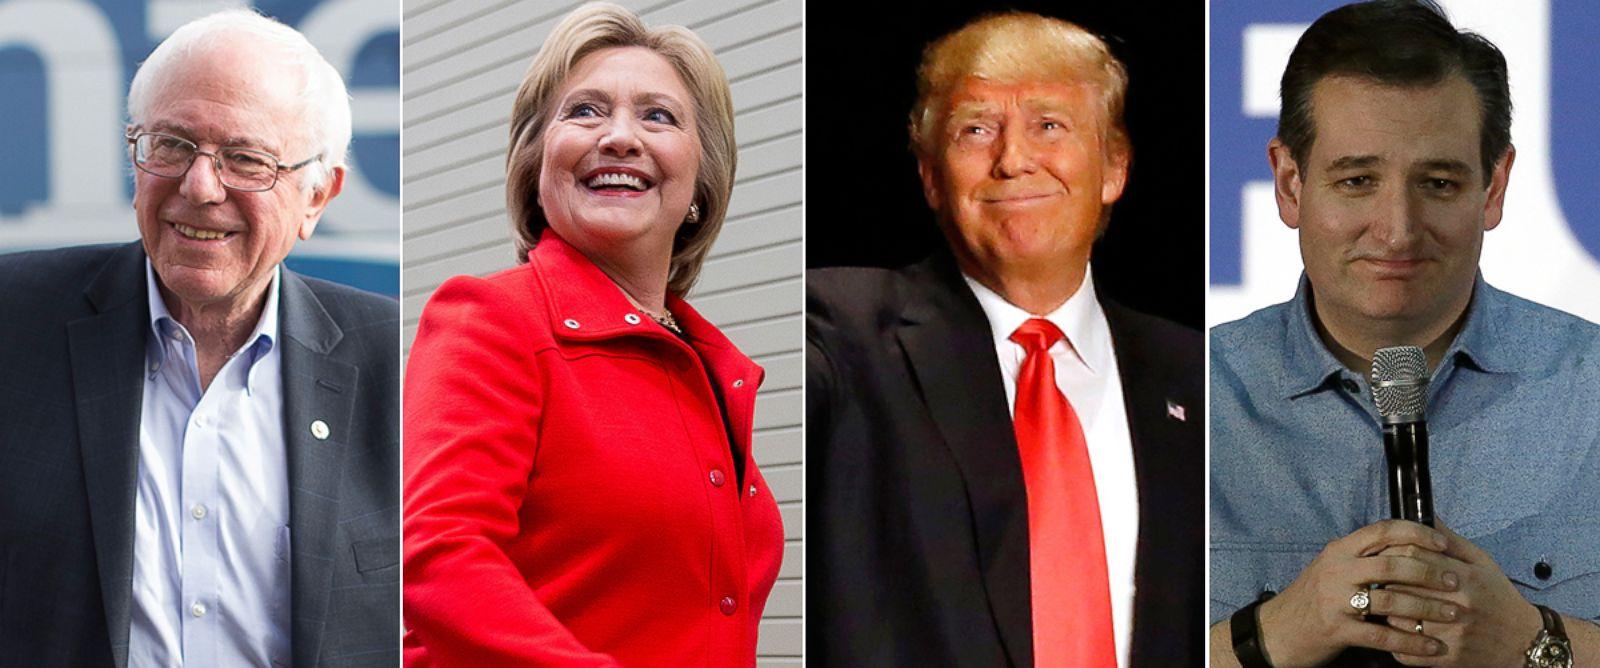 PHOTO: Bernie Sanders, Jan. 31, 2016, in Waterloo, Iowa. Hillary Clinton arrives in Des Moines, Jan. 30, 2016. Donald Trump walks onstage for an event in Sioux City, Iowa, Jan. 31, 2016. Ted Cruz speaks in Des Moines, Jan. 31, 2016, in Des Moines.